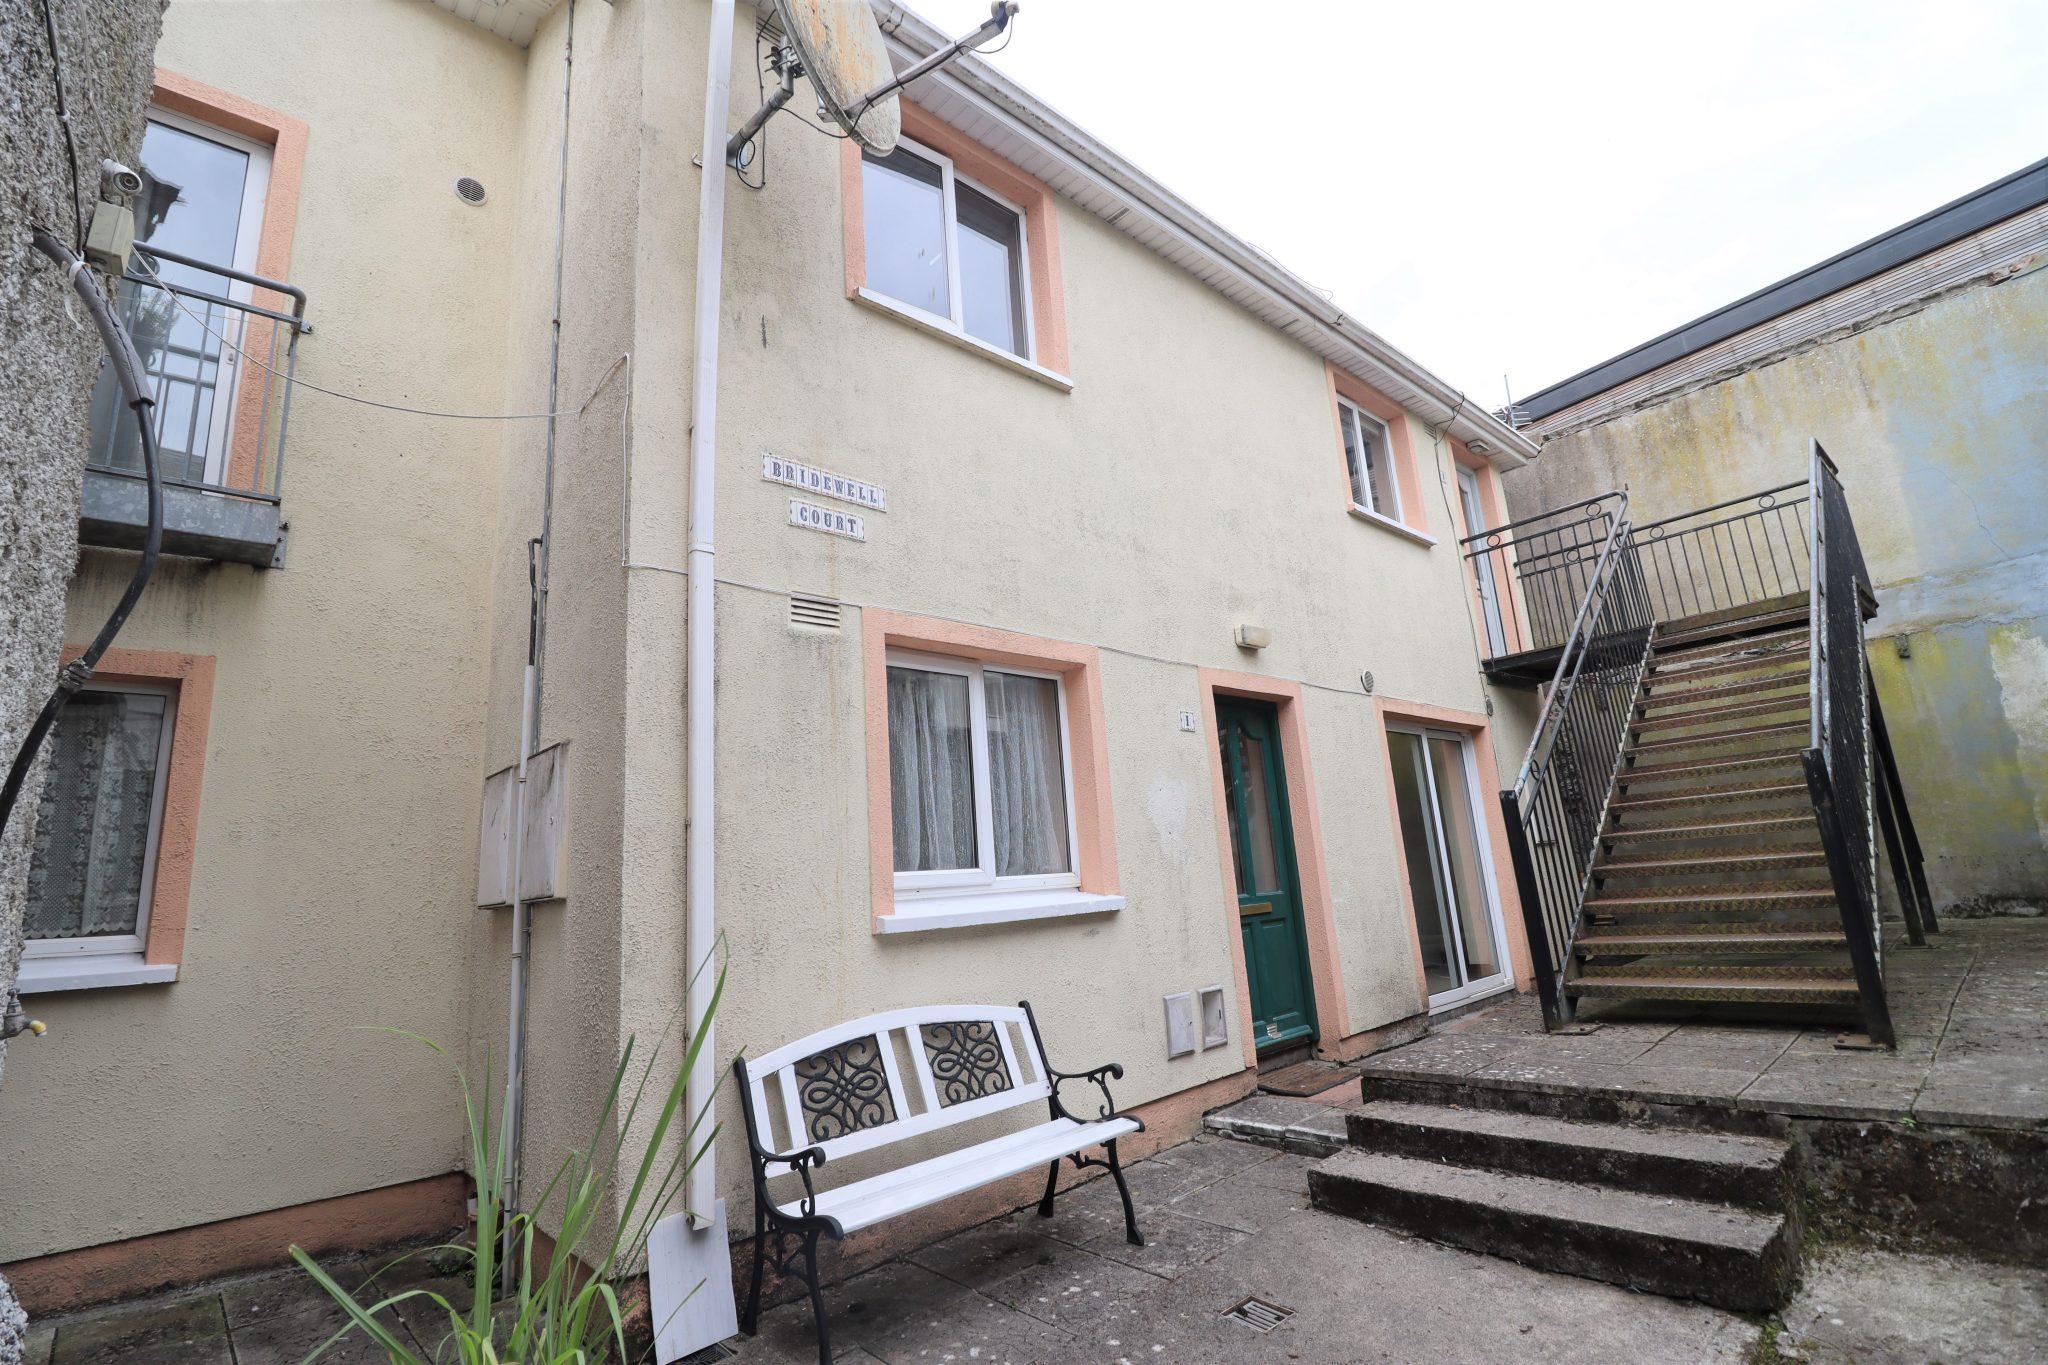 Apt 1 & 2 Bridewell Court, Bridewell Lane, Carlow